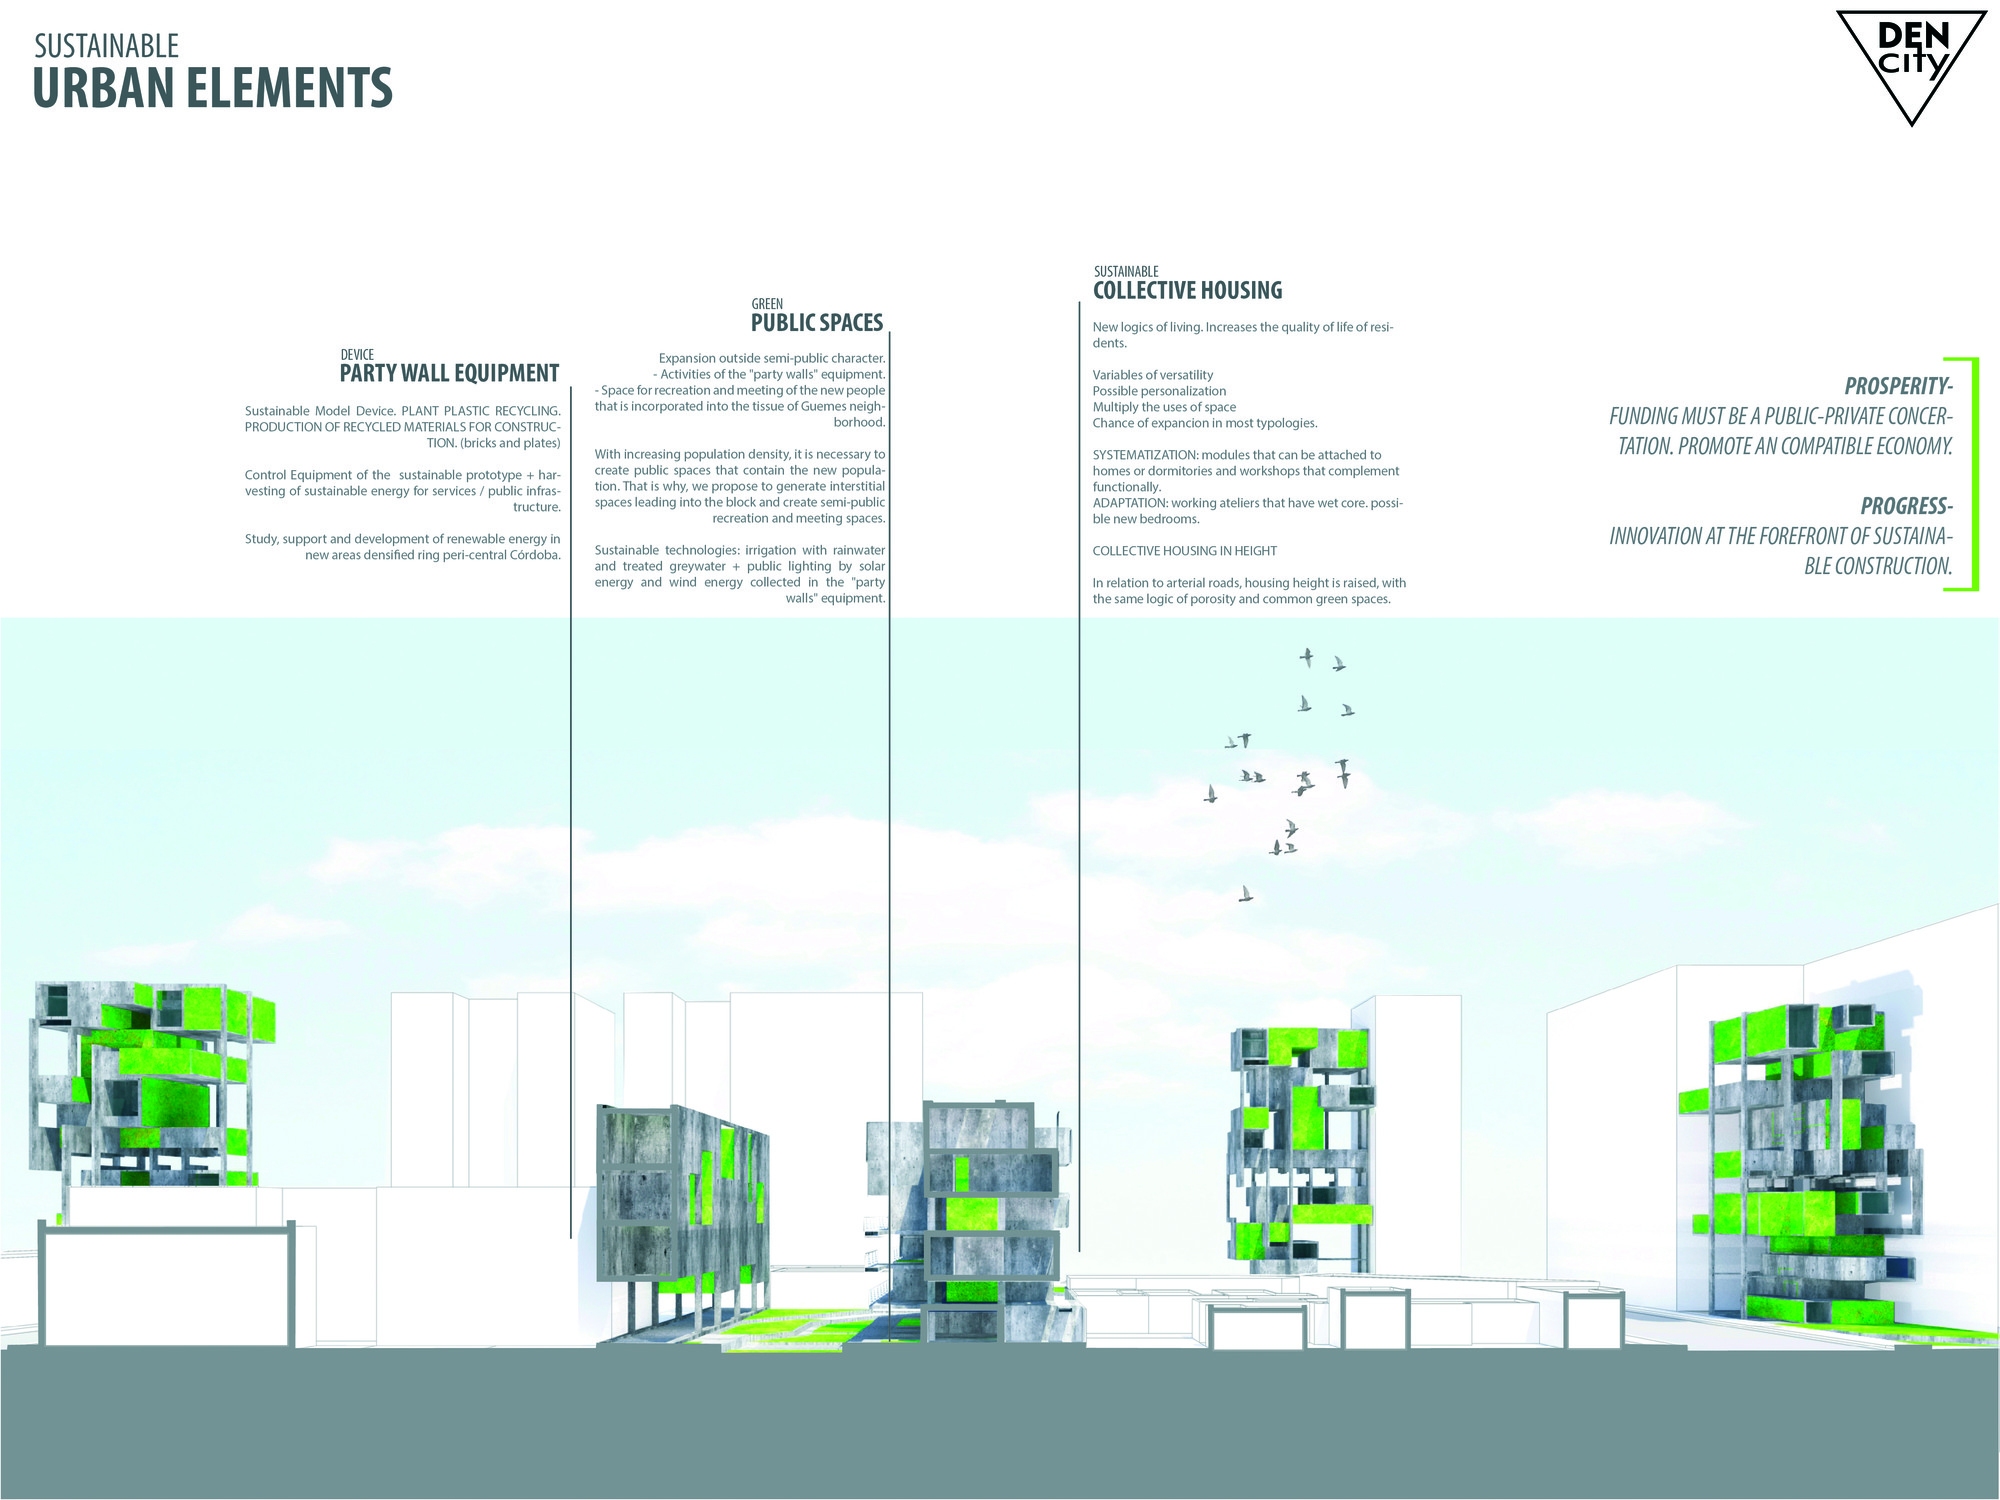 Next Generation: Den-City. Image Cortesia de Fundación Holcim